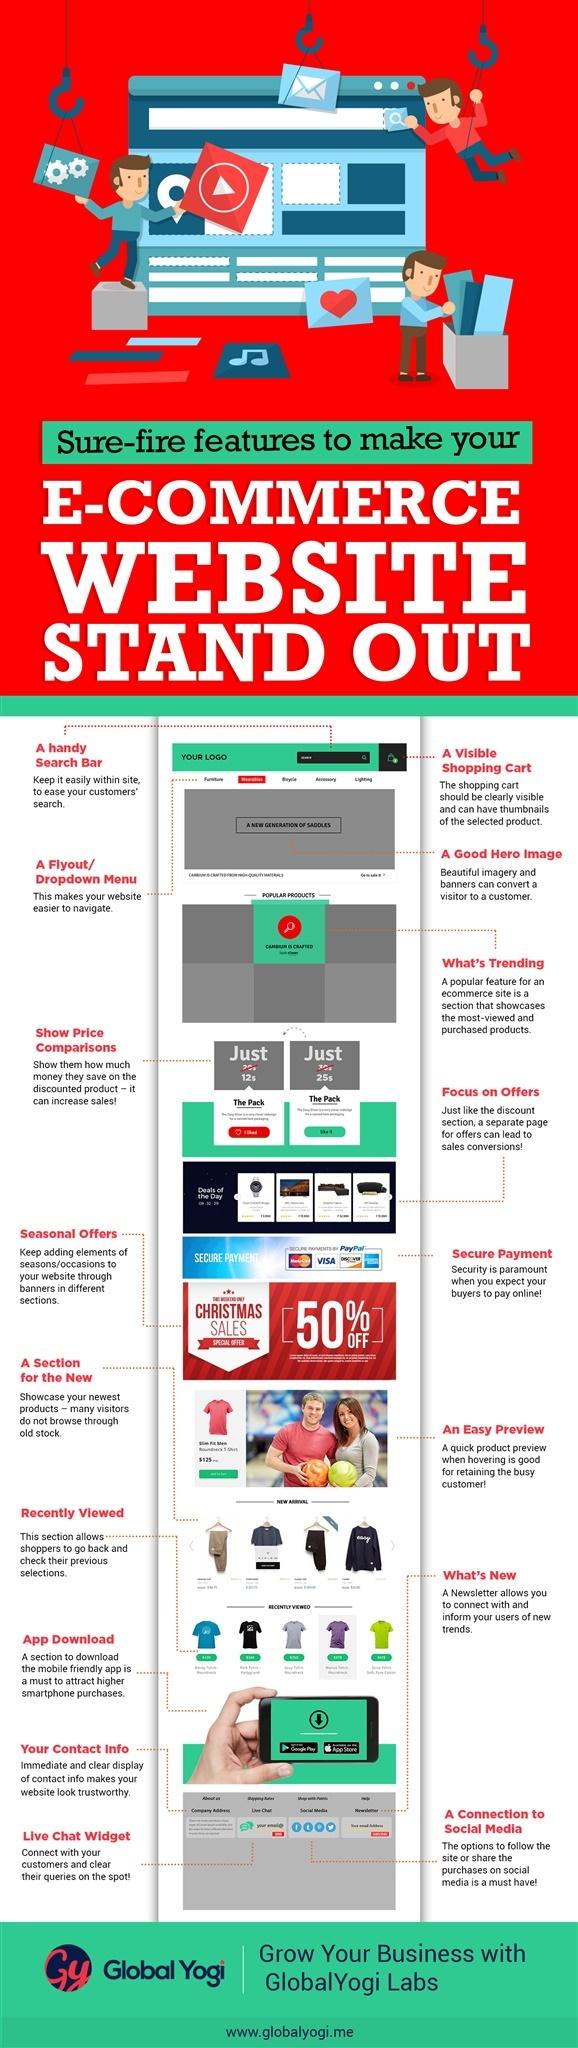 ECommerce Website Home Page Design